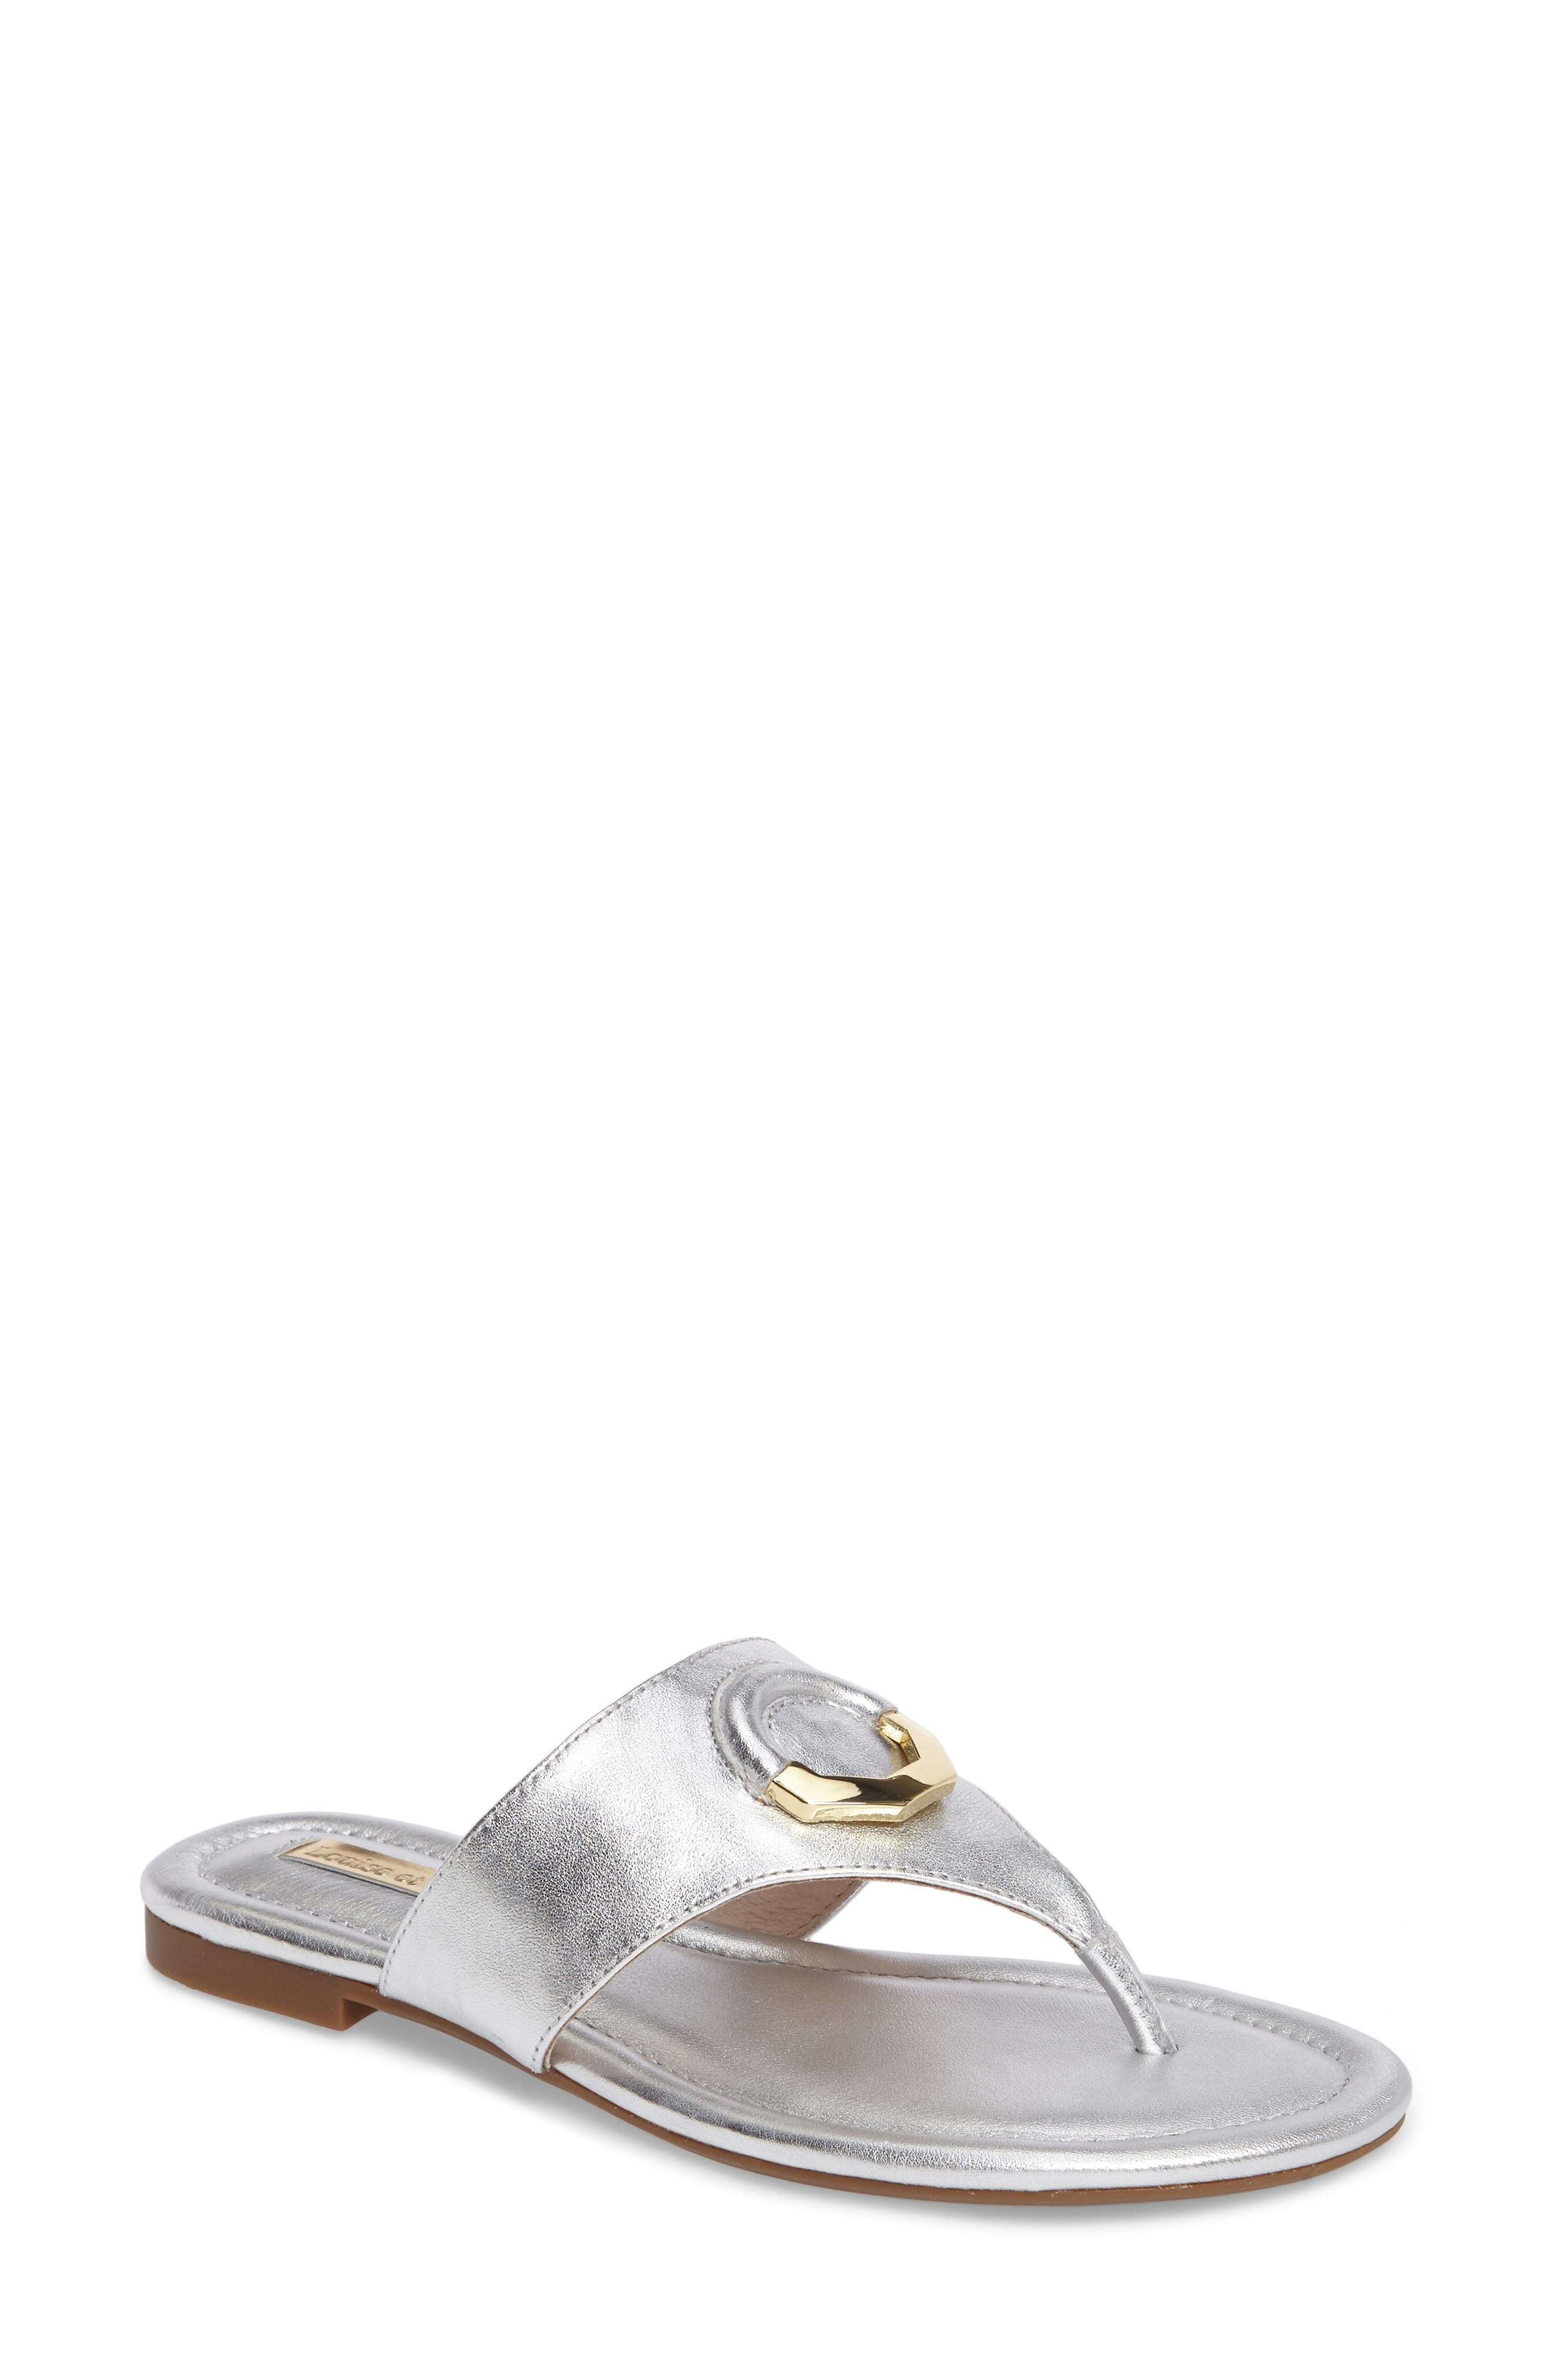 Adana Flip Flop,                         Main,                         color, Sterling Leather